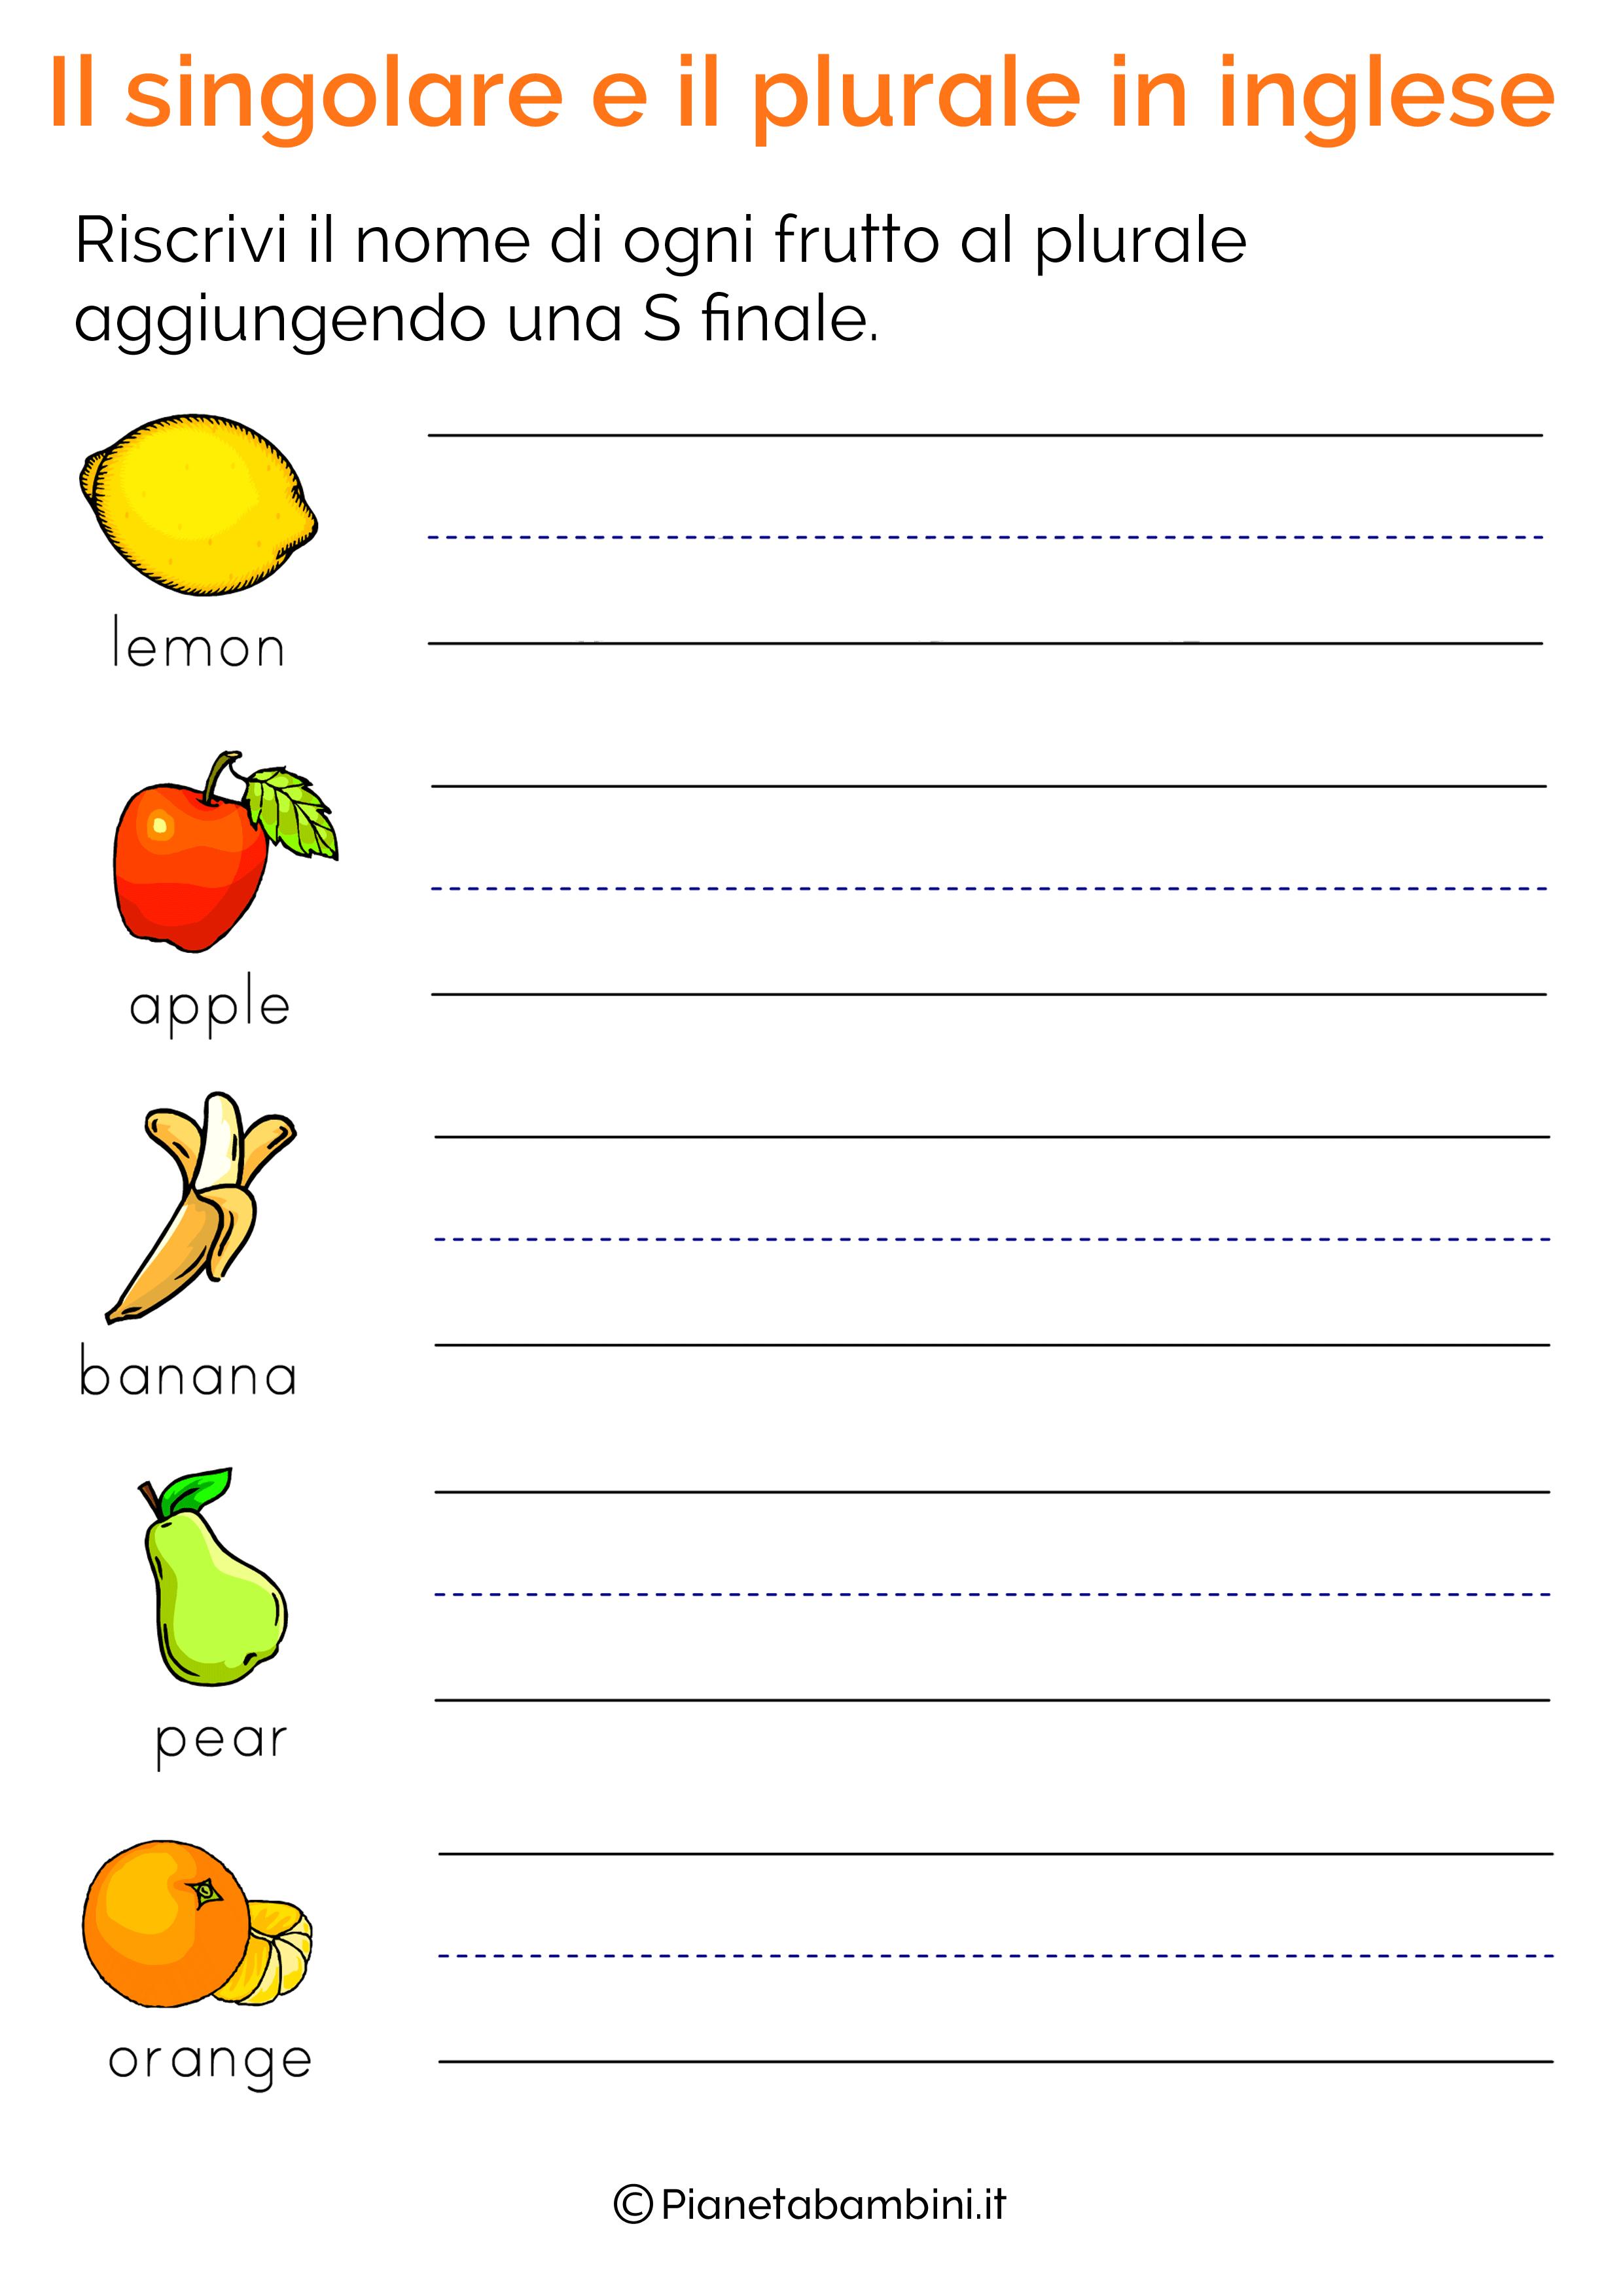 Esercizi-Singolare-Plurale-Inglese-05